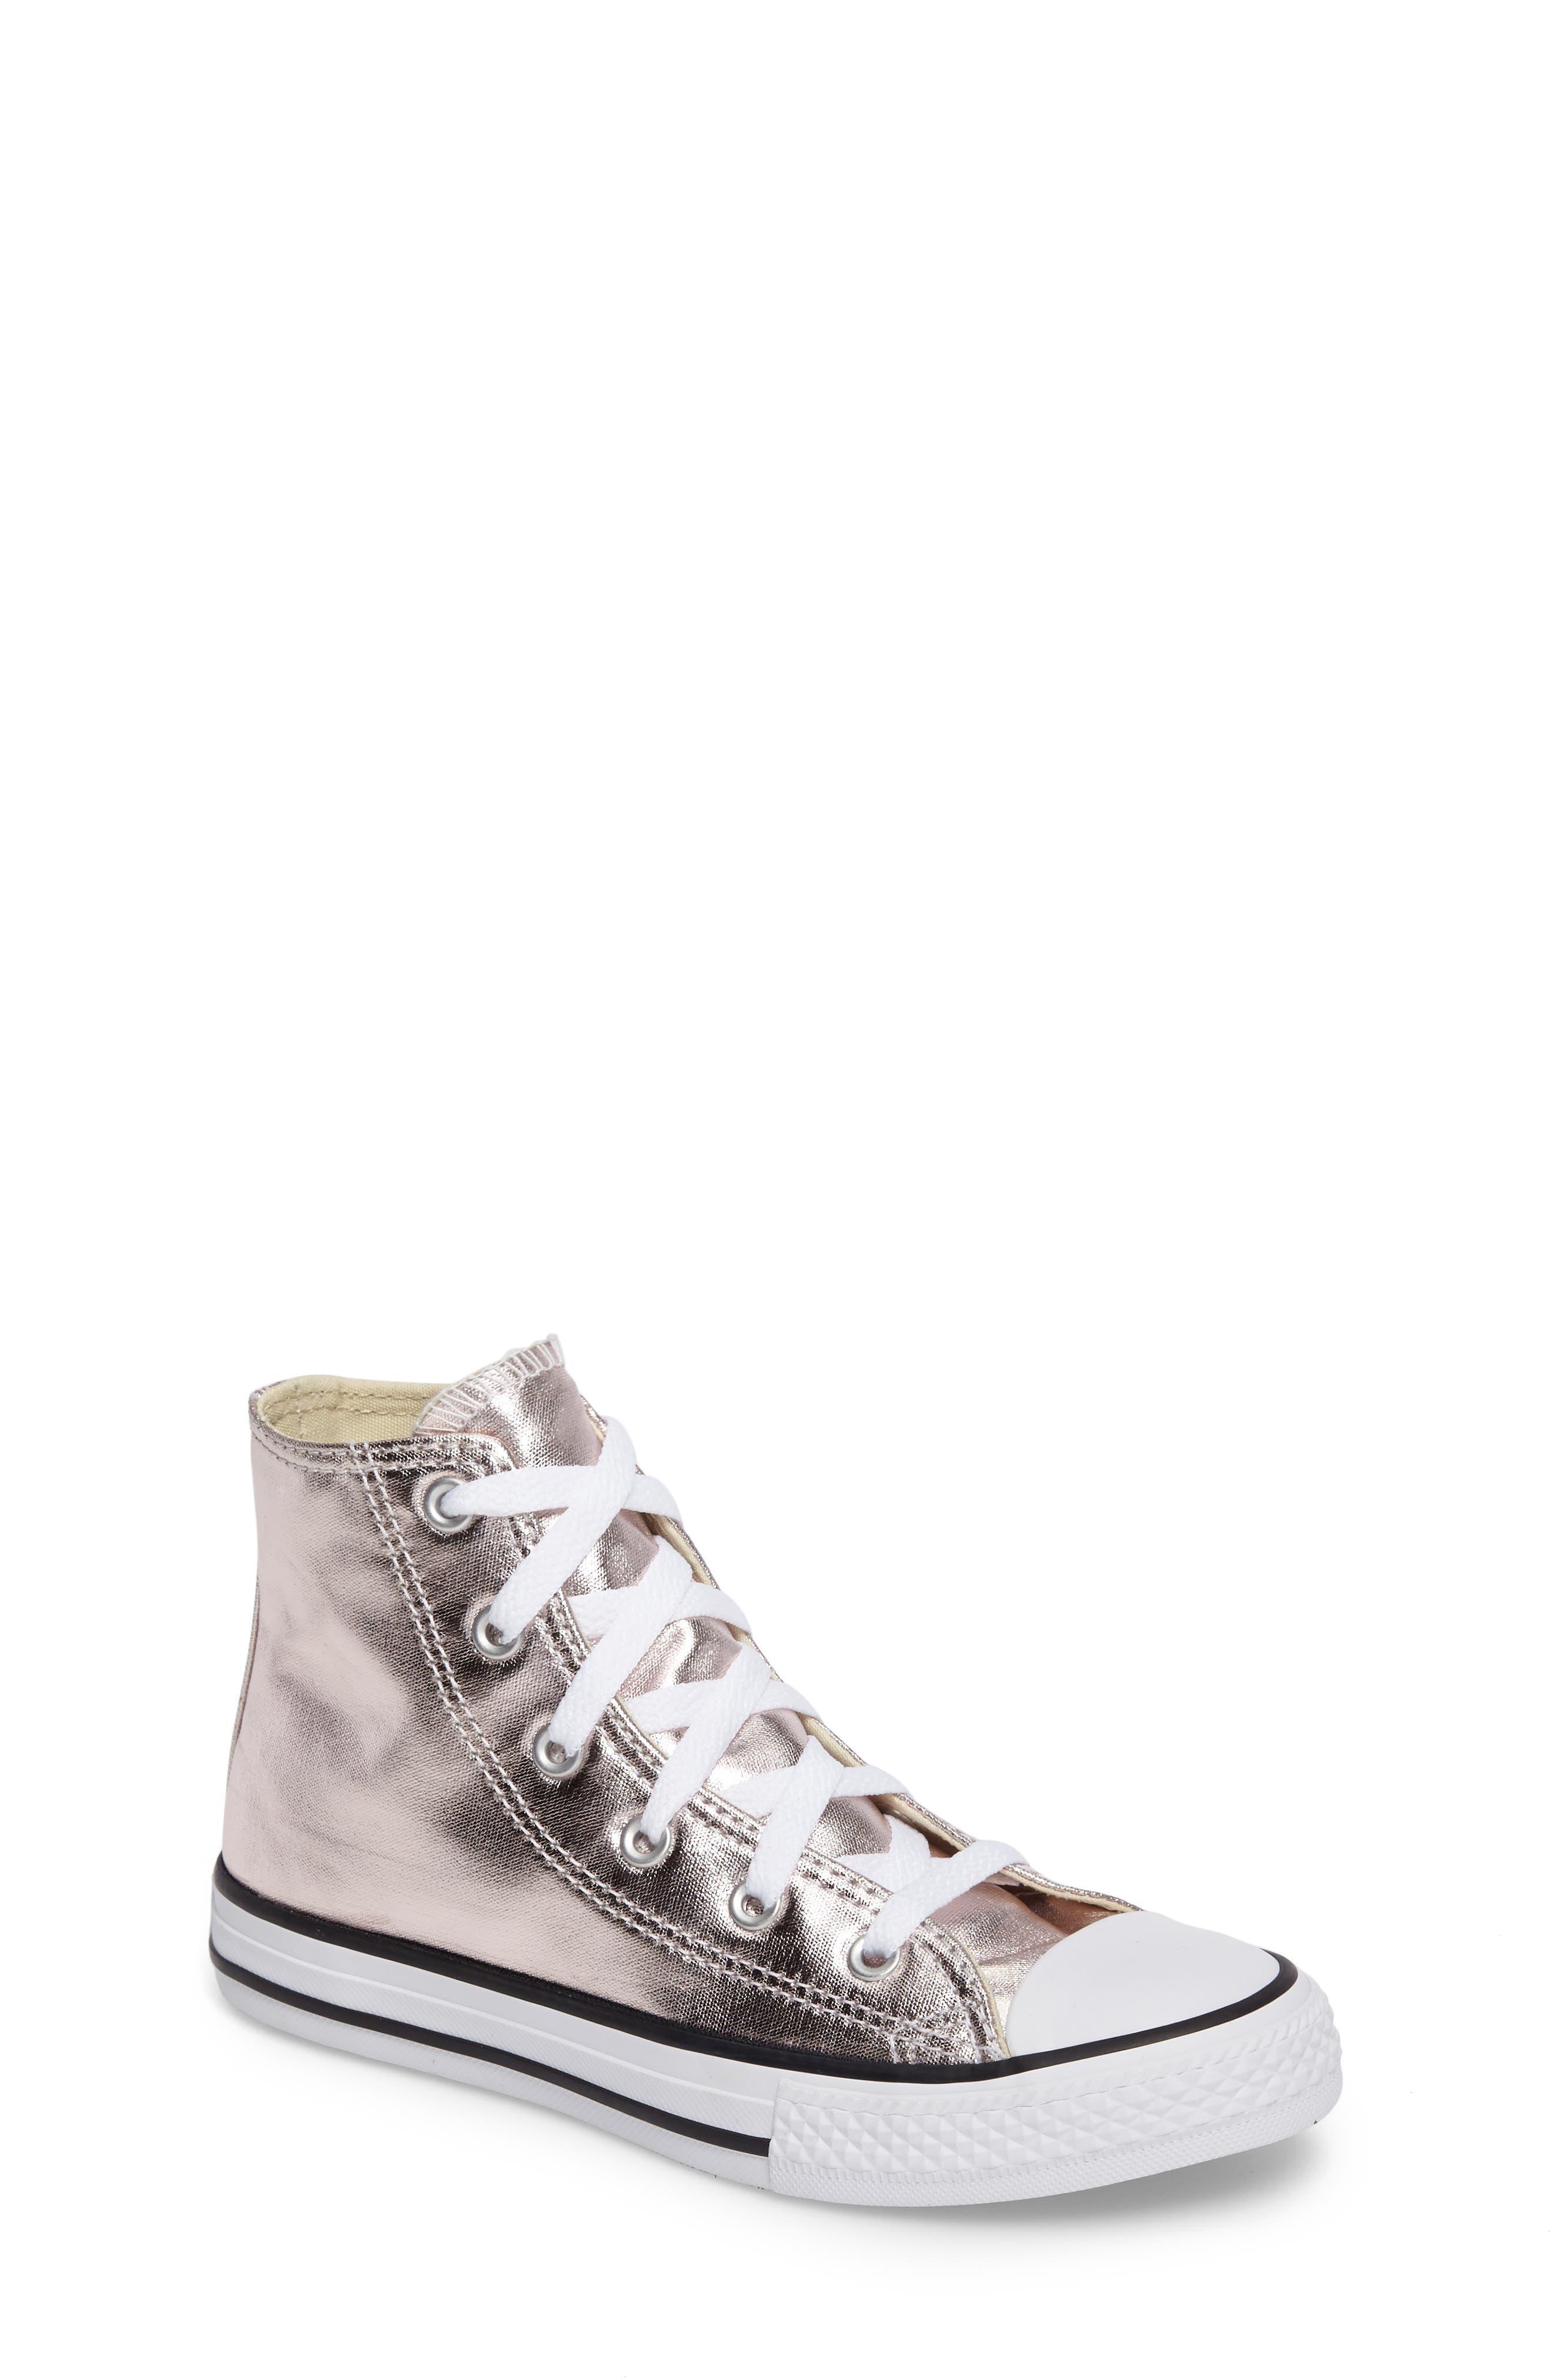 Chuck Taylor<sup>®</sup> All Star<sup>®</sup> Seasonal Metallic High Top Sneaker,                             Main thumbnail 1, color,                             221